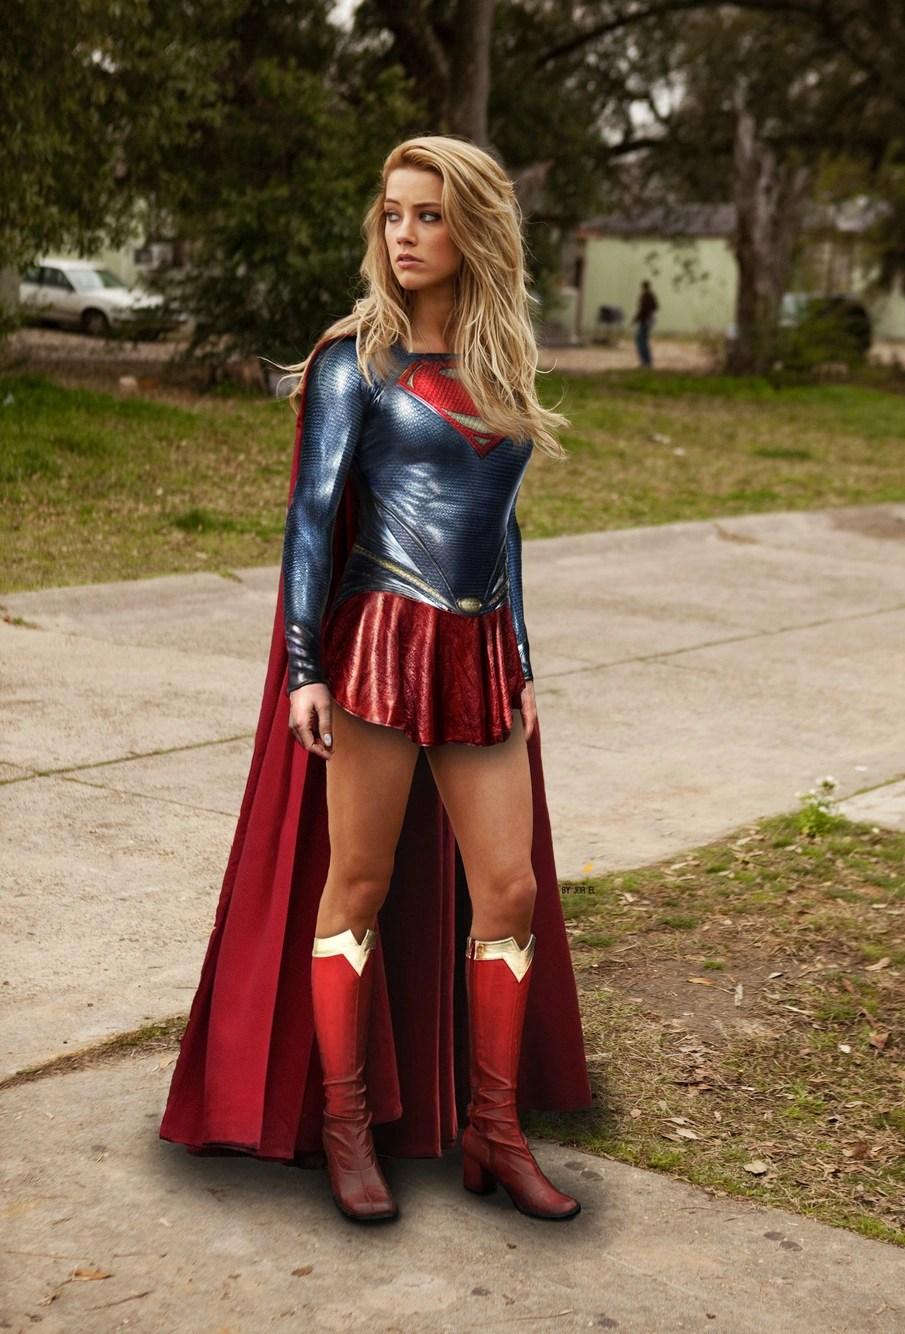 Amber Heard Supergirl Tv Series - Year of Clean Water